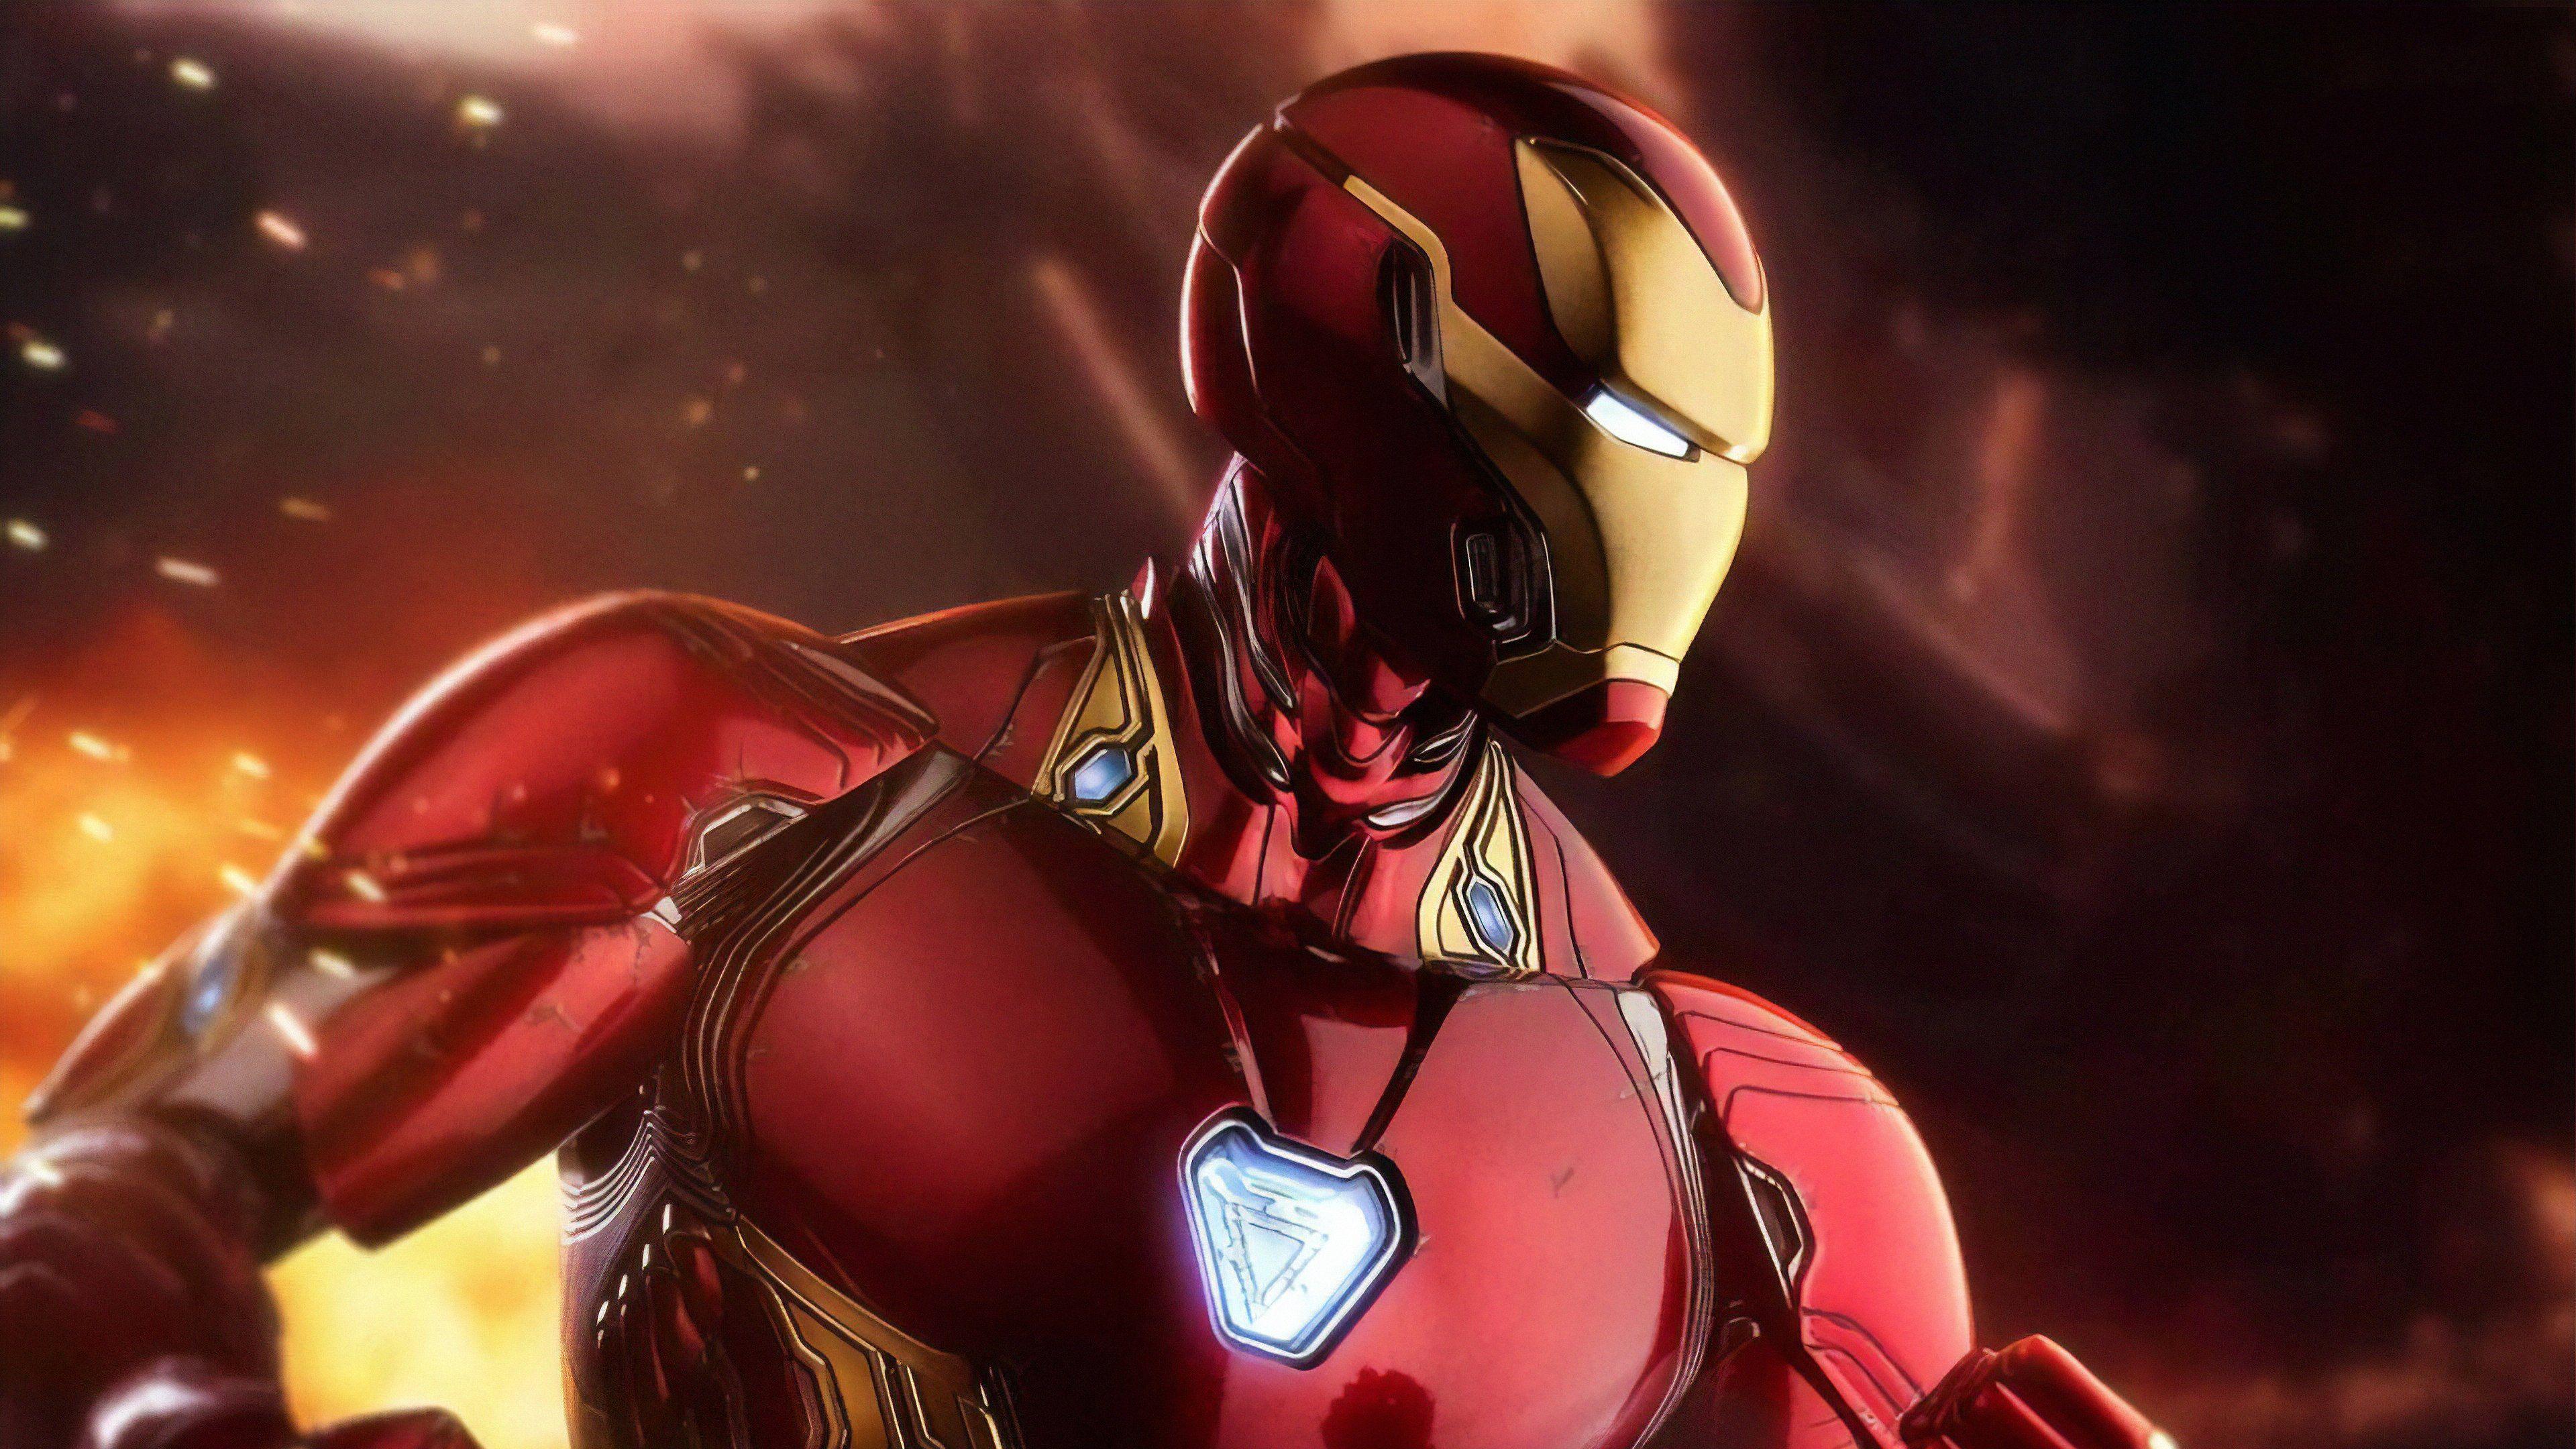 Iron Man Desktop IMA Wallpapers - Wallpaper Cave